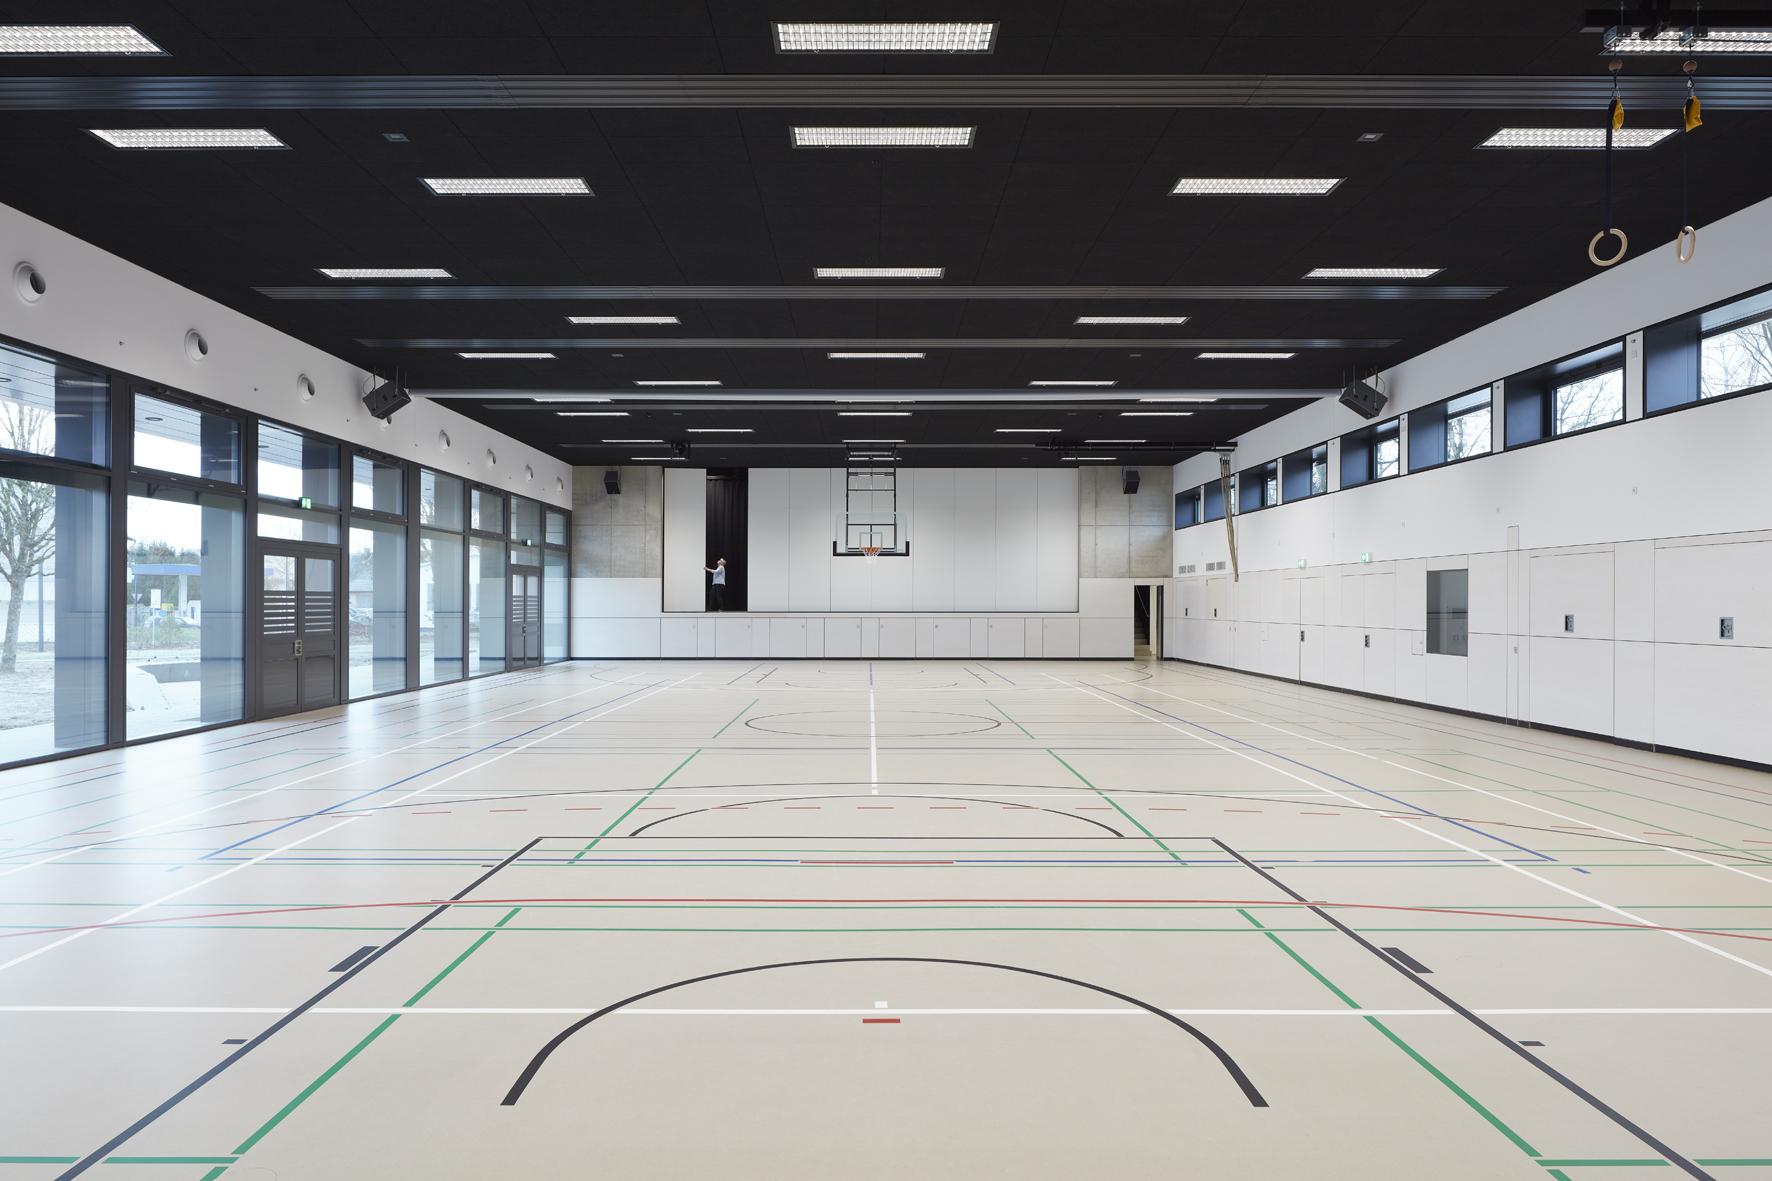 Mehrzweckhalle Massenbachhausen_samba 007